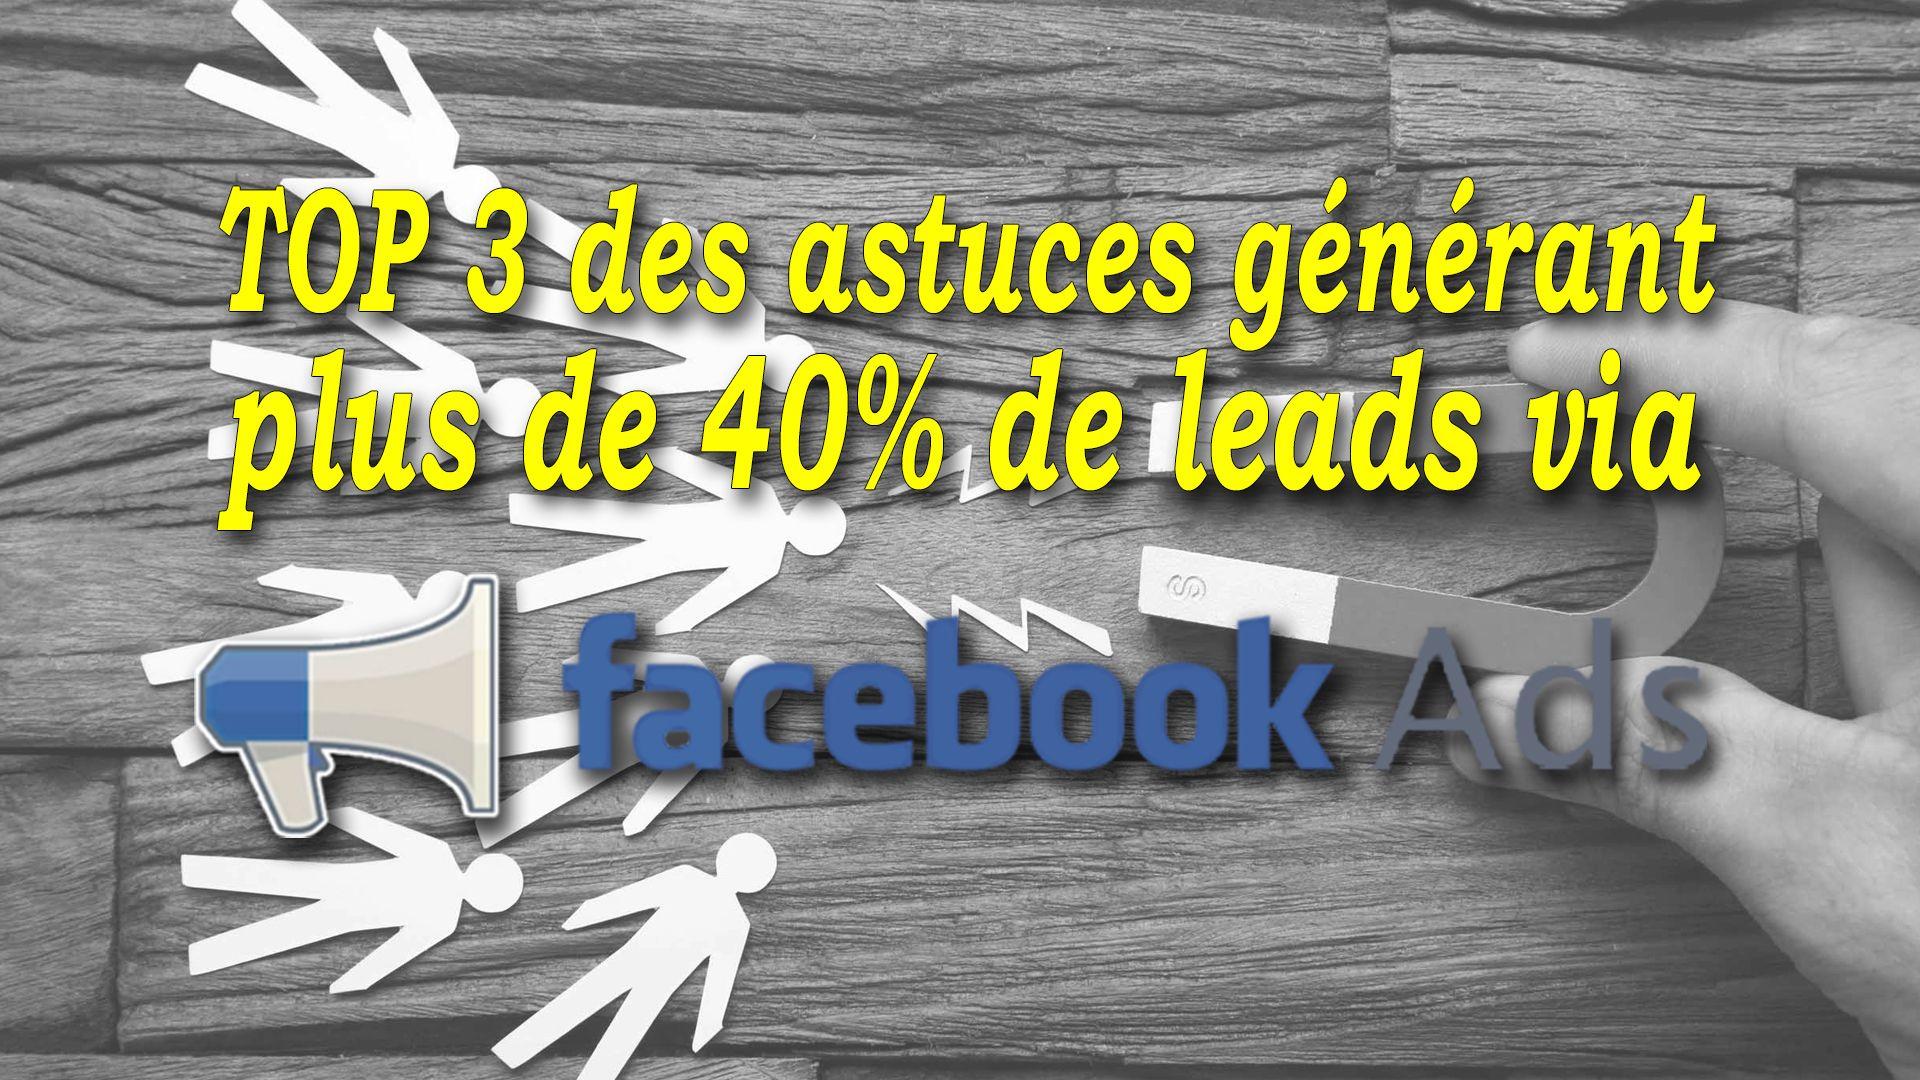 TOP 3 des astuces générant plus de 40% de leads via Facebook Ads #GrowthHacking #WebMarketing #FormationGrowthHacking #CentreDeFormationFrance #TunnelAARRR #AARRR #SocialMedia #CommunityManagement #SEO #Facebook #FacebookAds